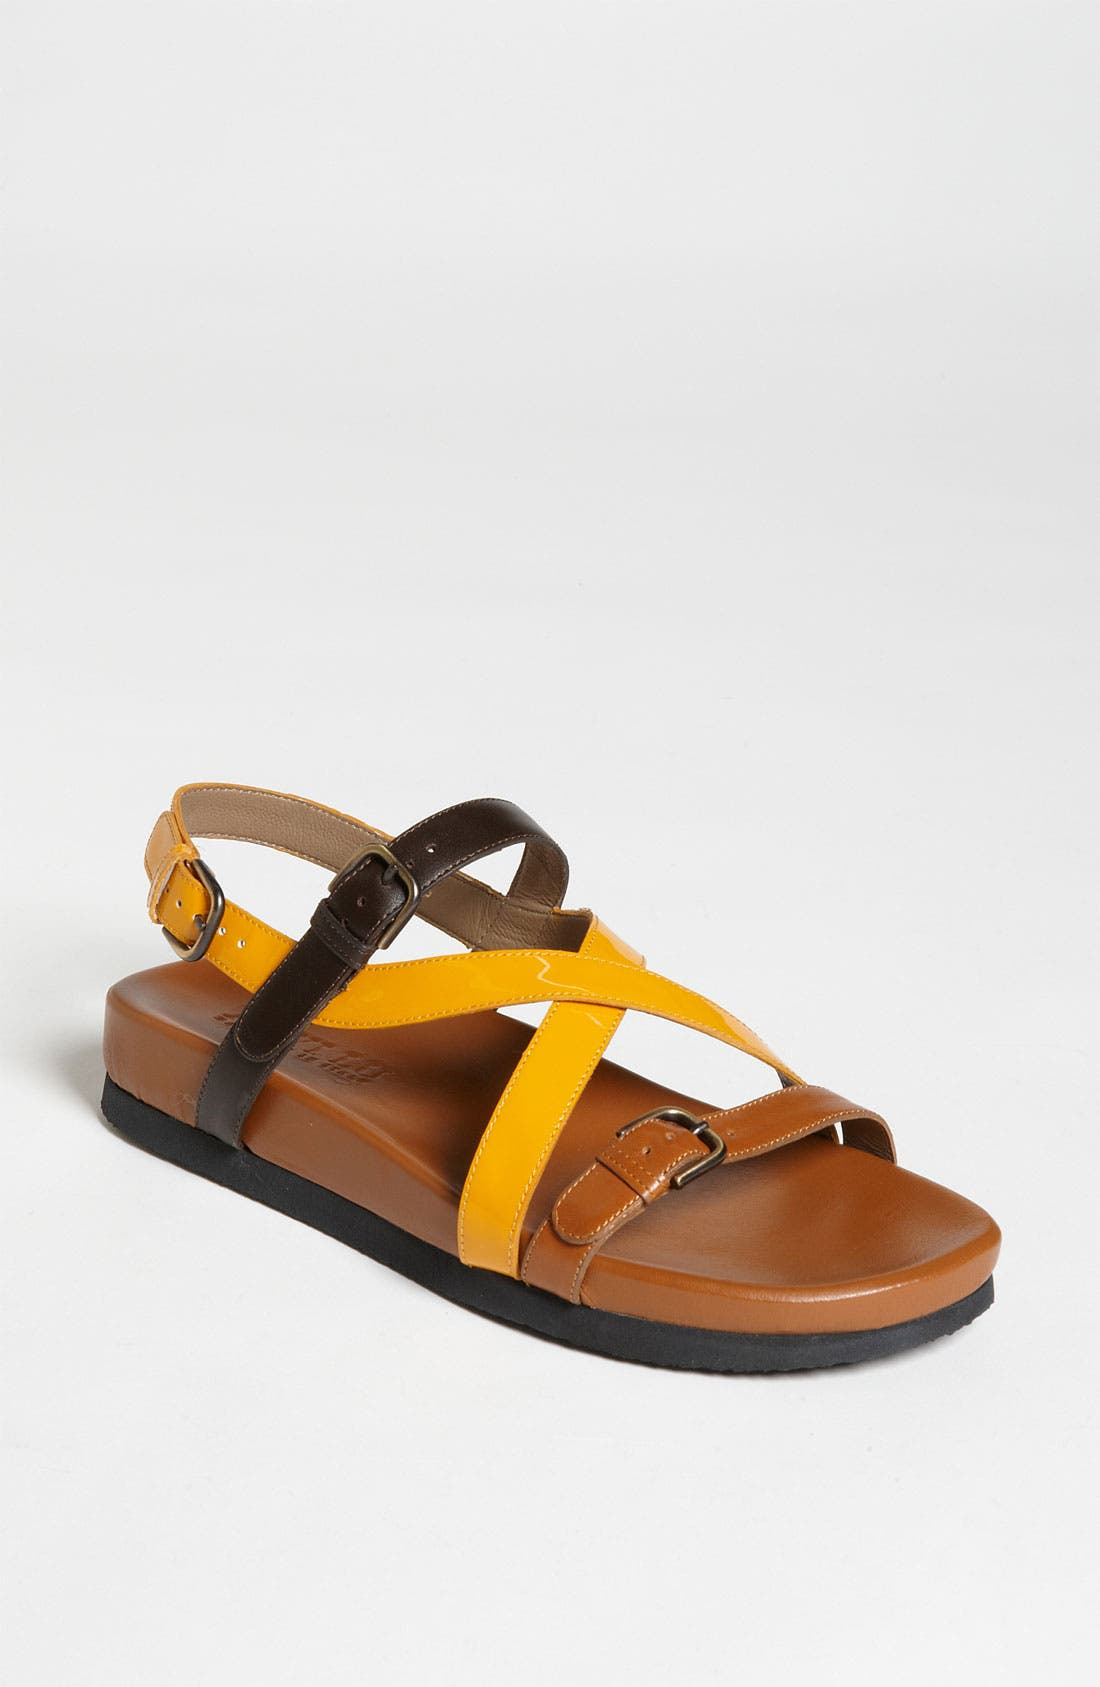 Main Image - Anyi Lu 'Vera' Sandal